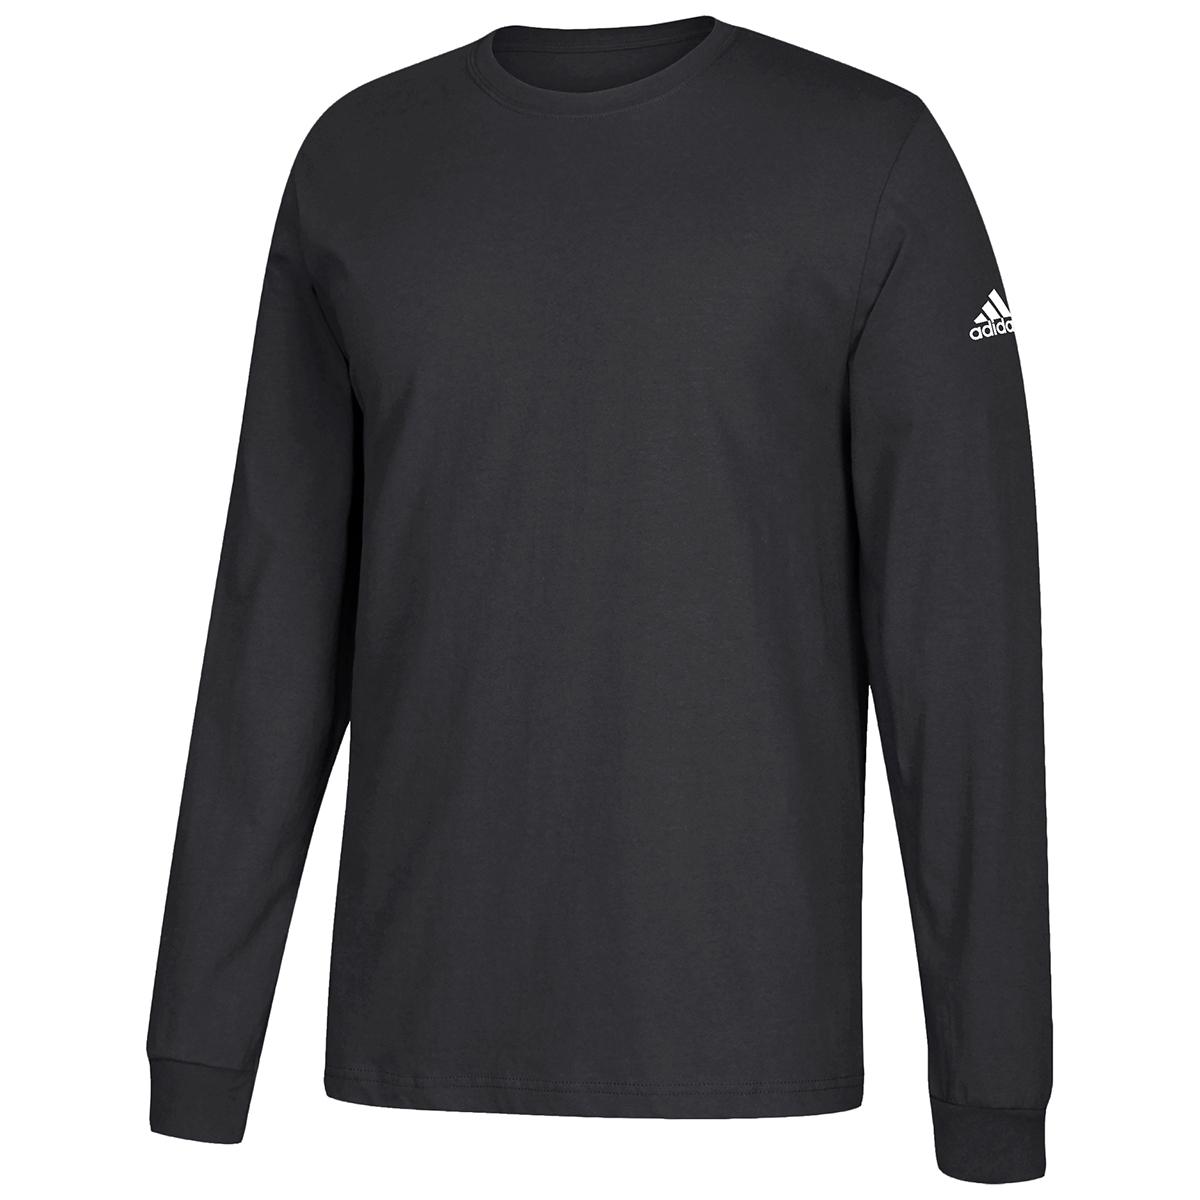 Adidas Men's Performance Long-Sleeve Tee - Black, S